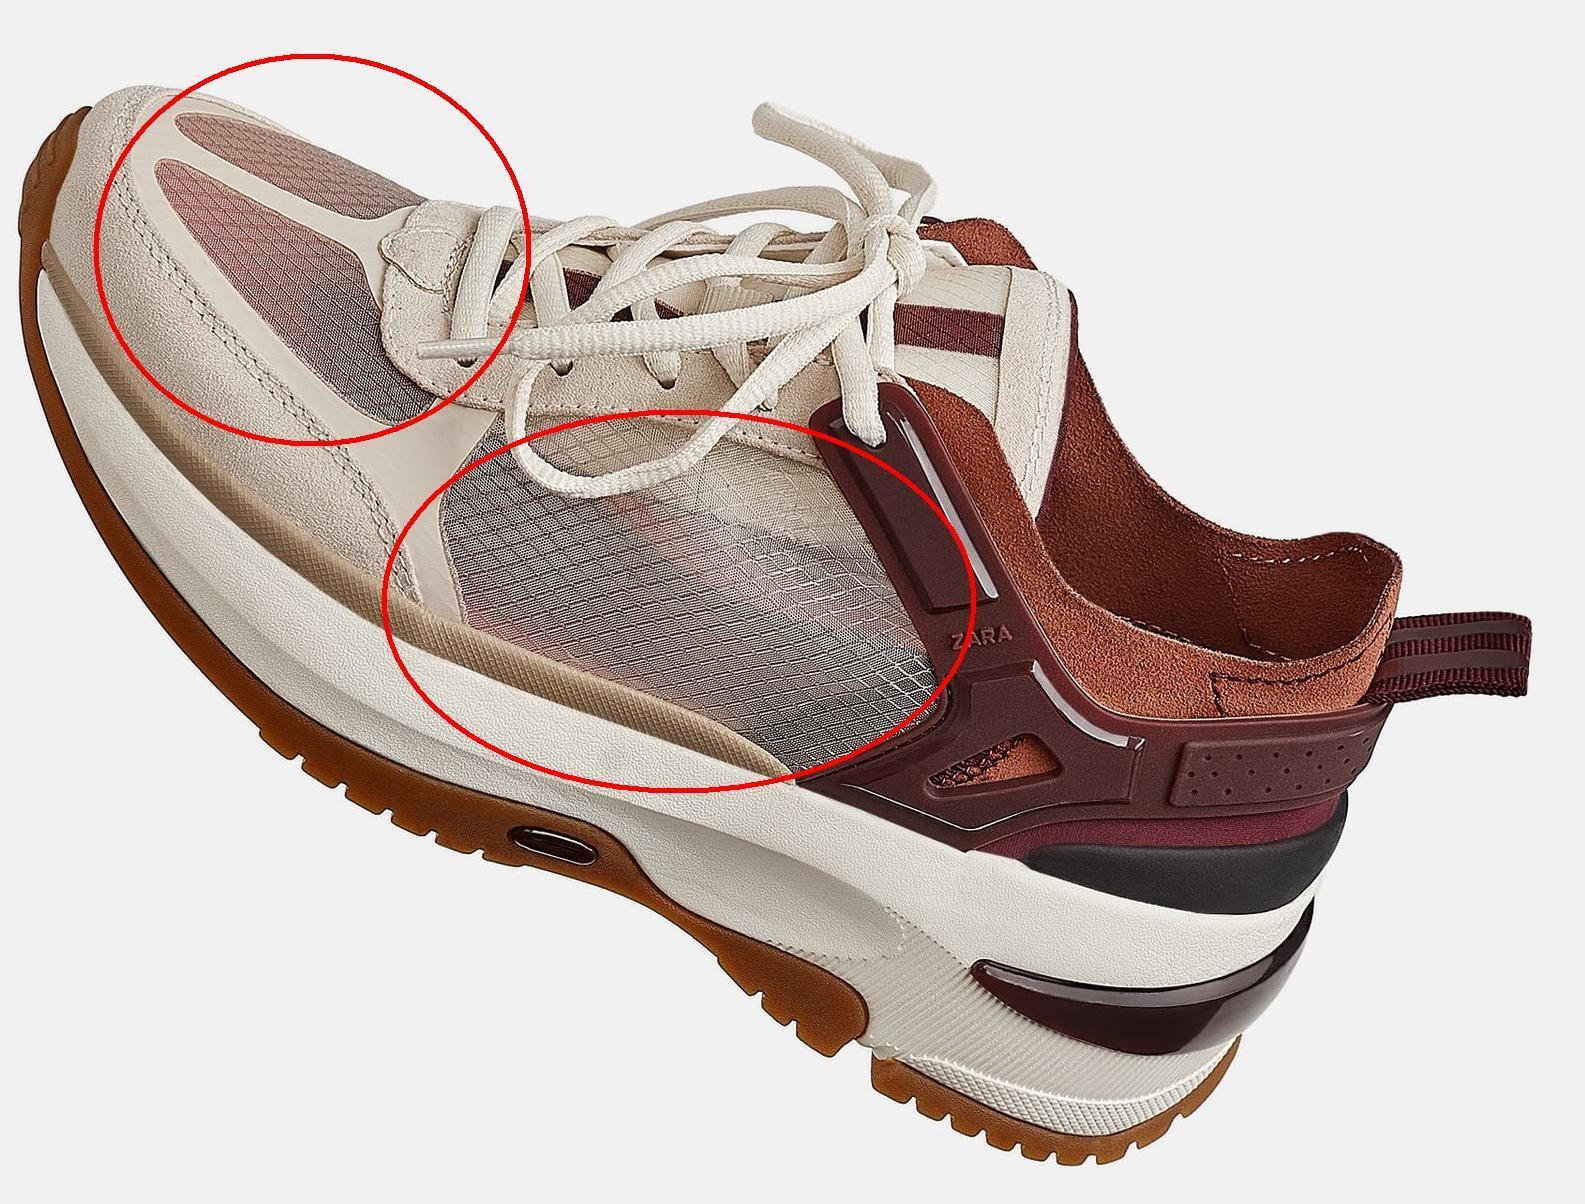 Mono mesh shoe lining mesh 2